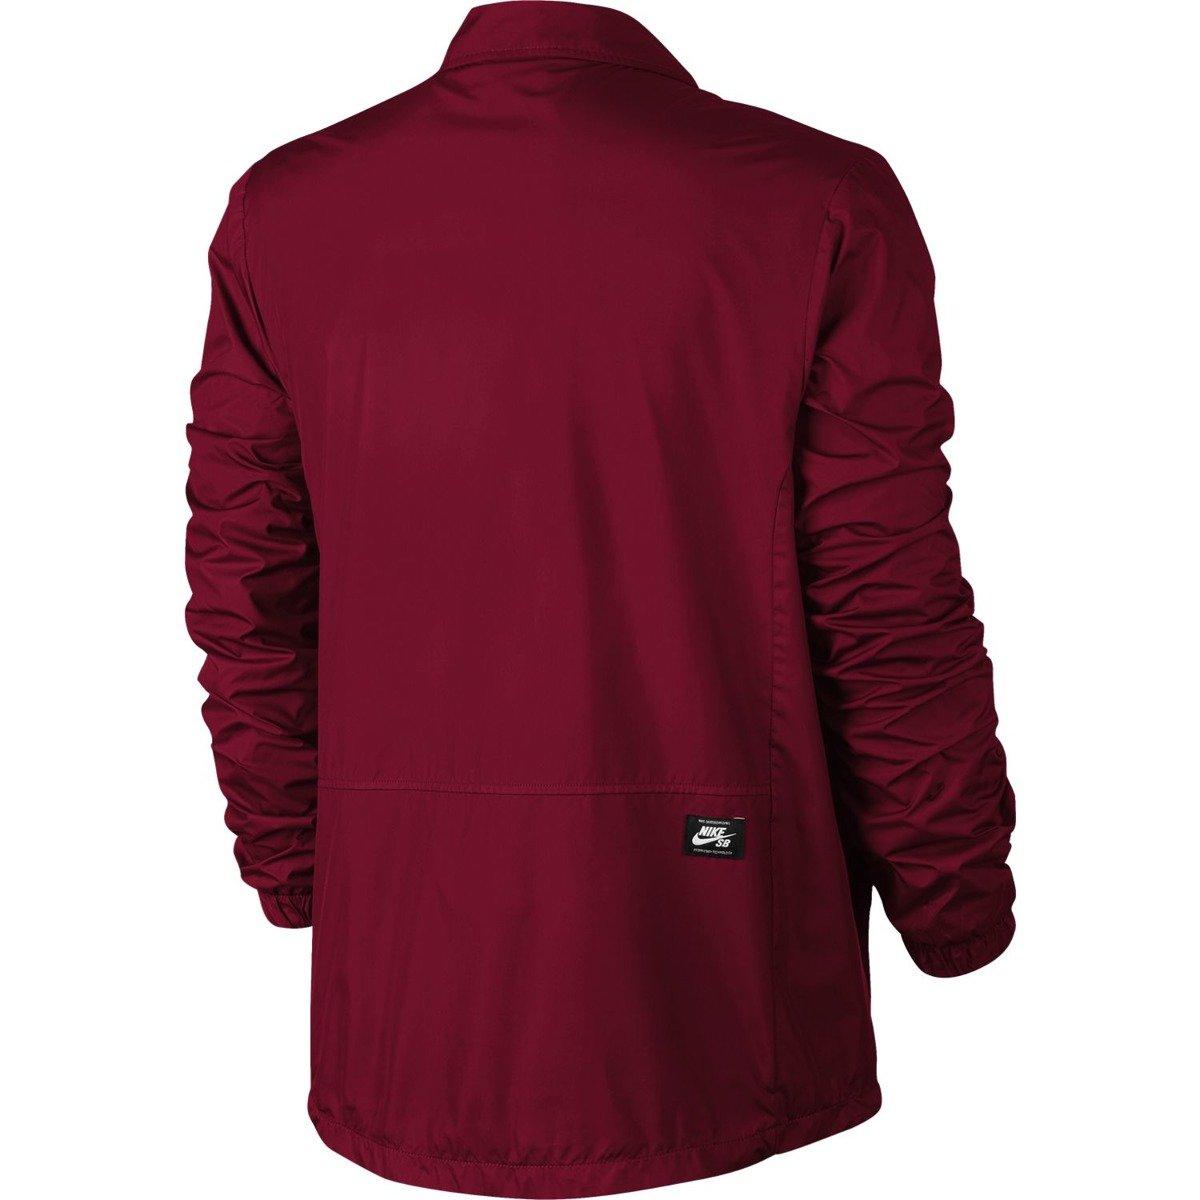 9c768cde nike sb shield jacket red crush/white red | Clothes \ Jackets Brands \ Nike  SB Odzież \ Nike SB \ Nike Fall 2017 | Skateshop Miniramp.pl